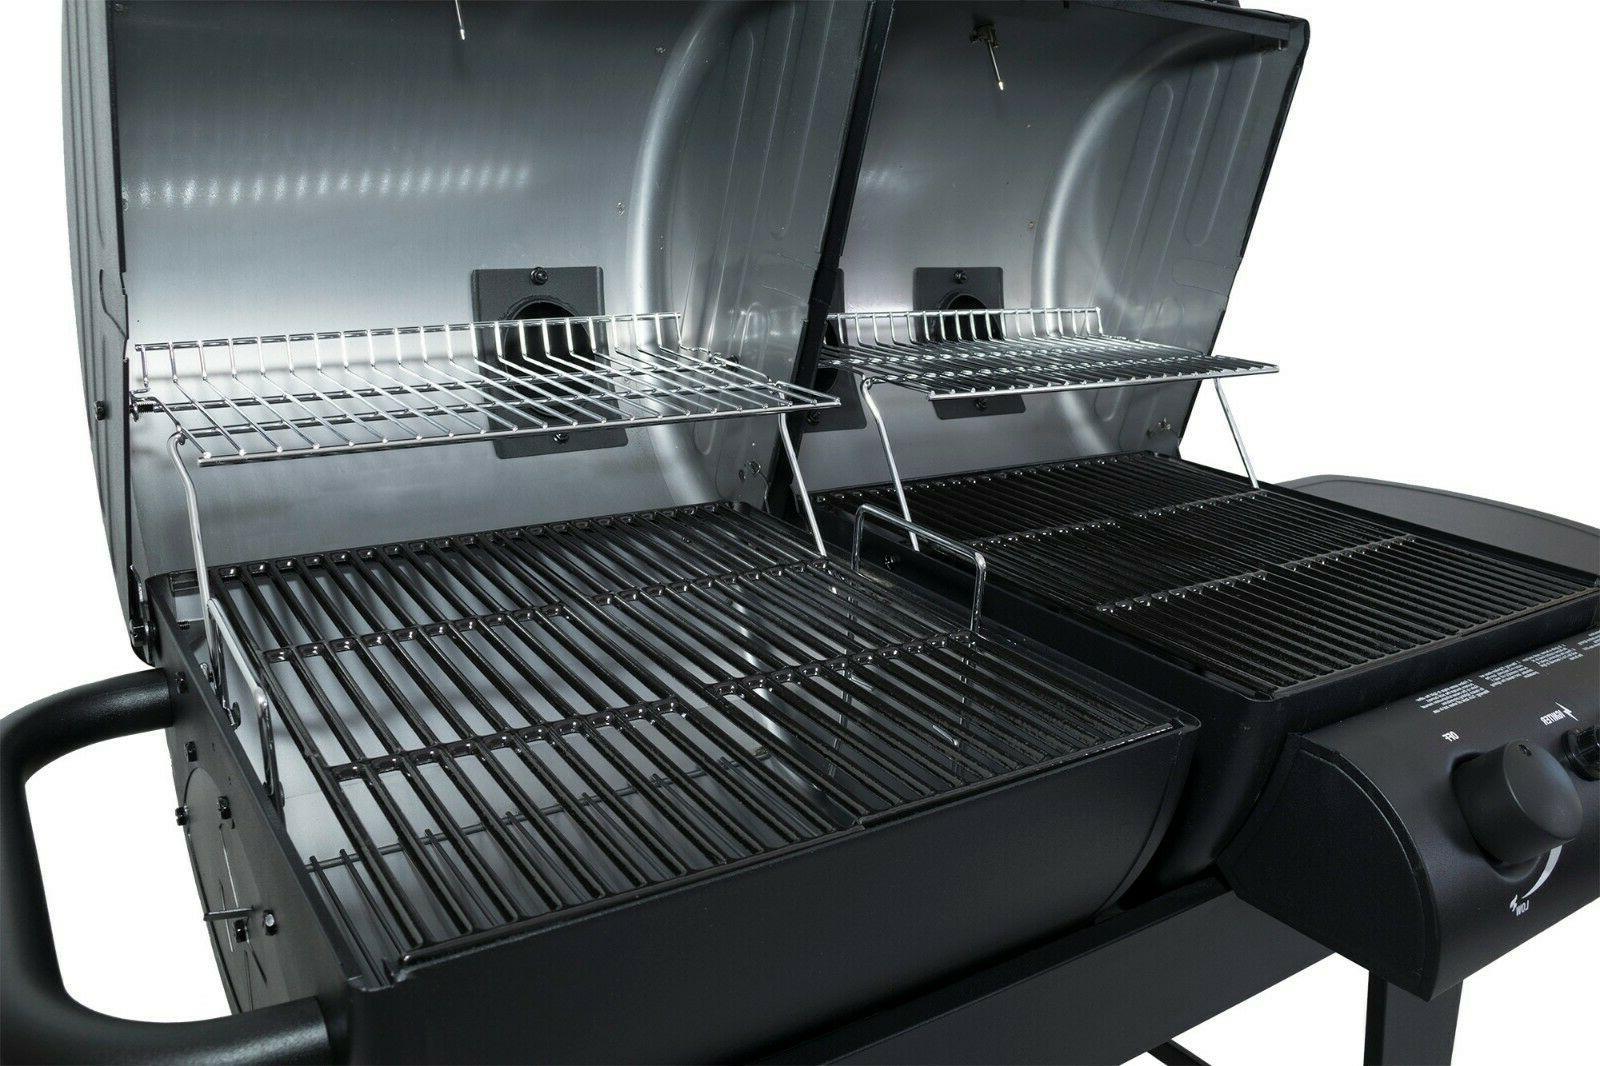 Dual Burner Charcoal/Gas Grill Pan Barbecue Cooking Backyard